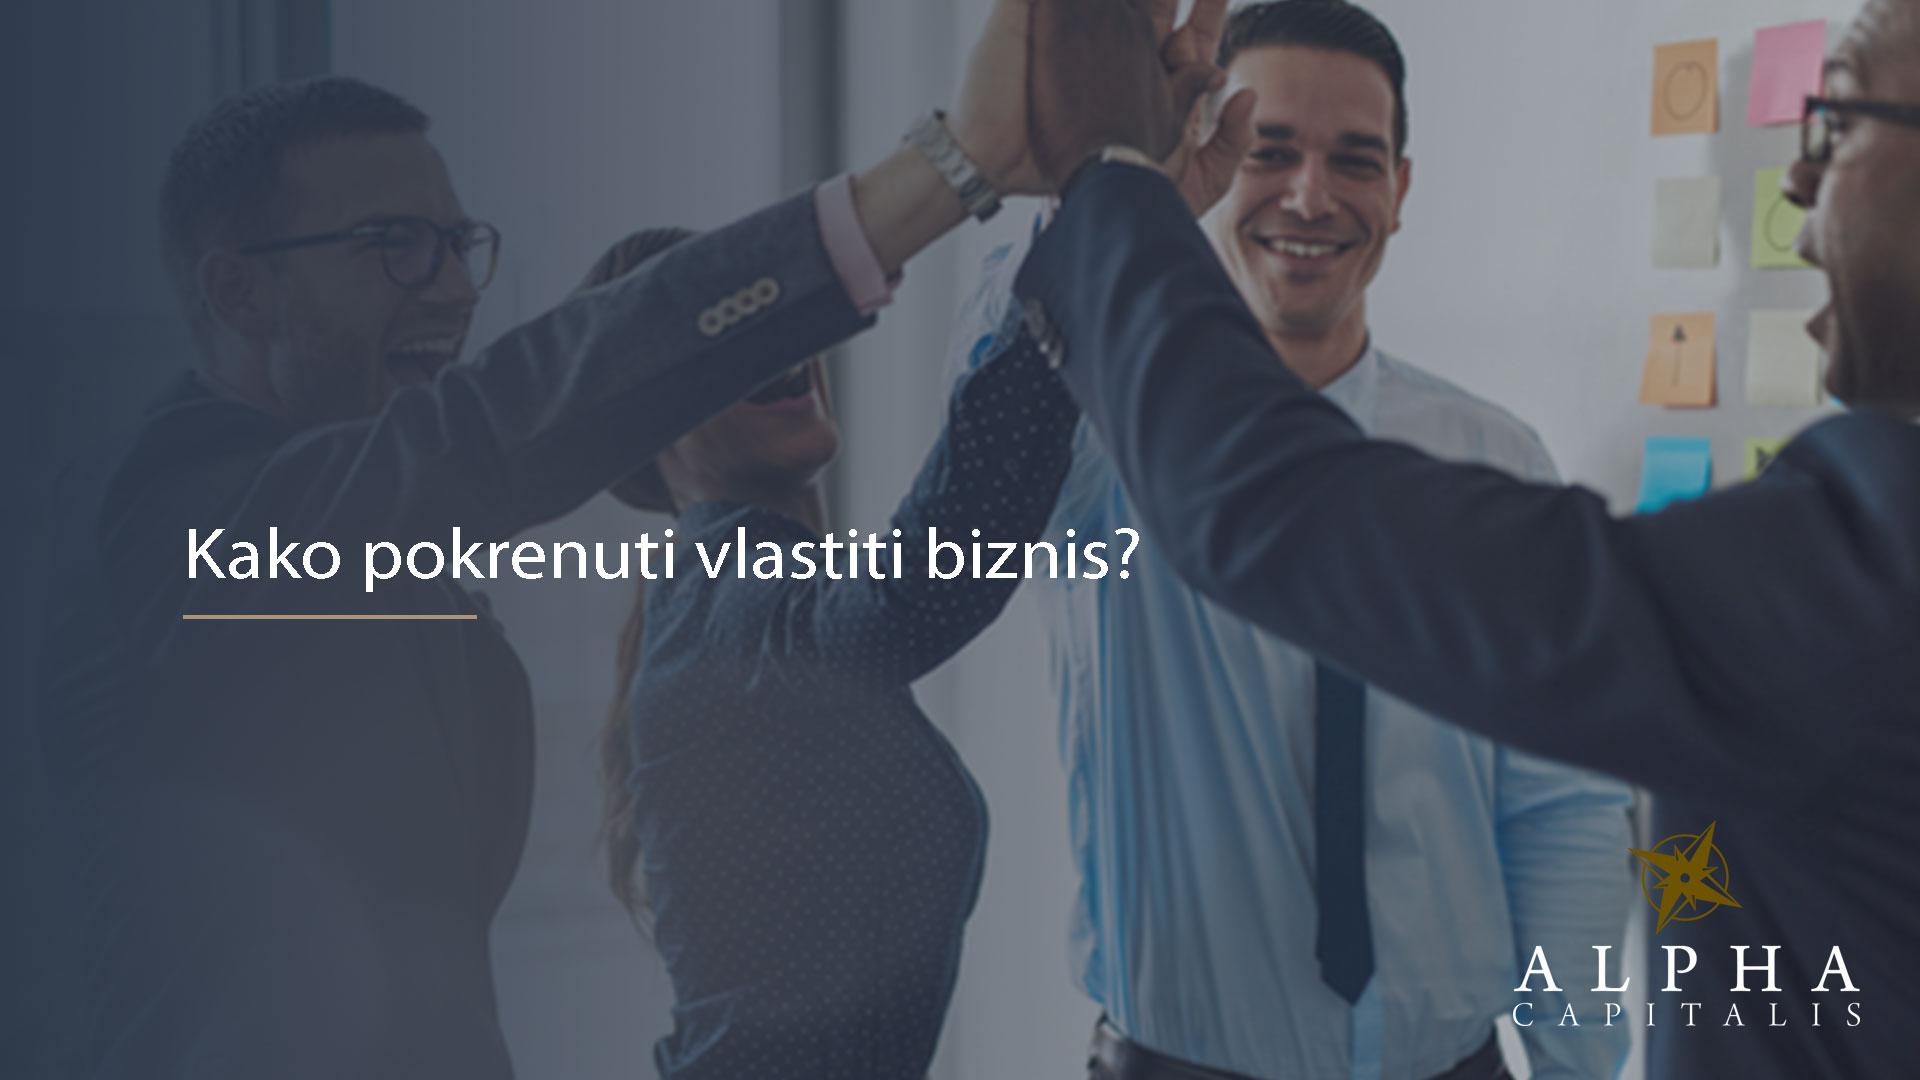 Kako pokrenuti vlastiti biznis 2020 02 17 - Kako pokrenuti vlastiti biznis?